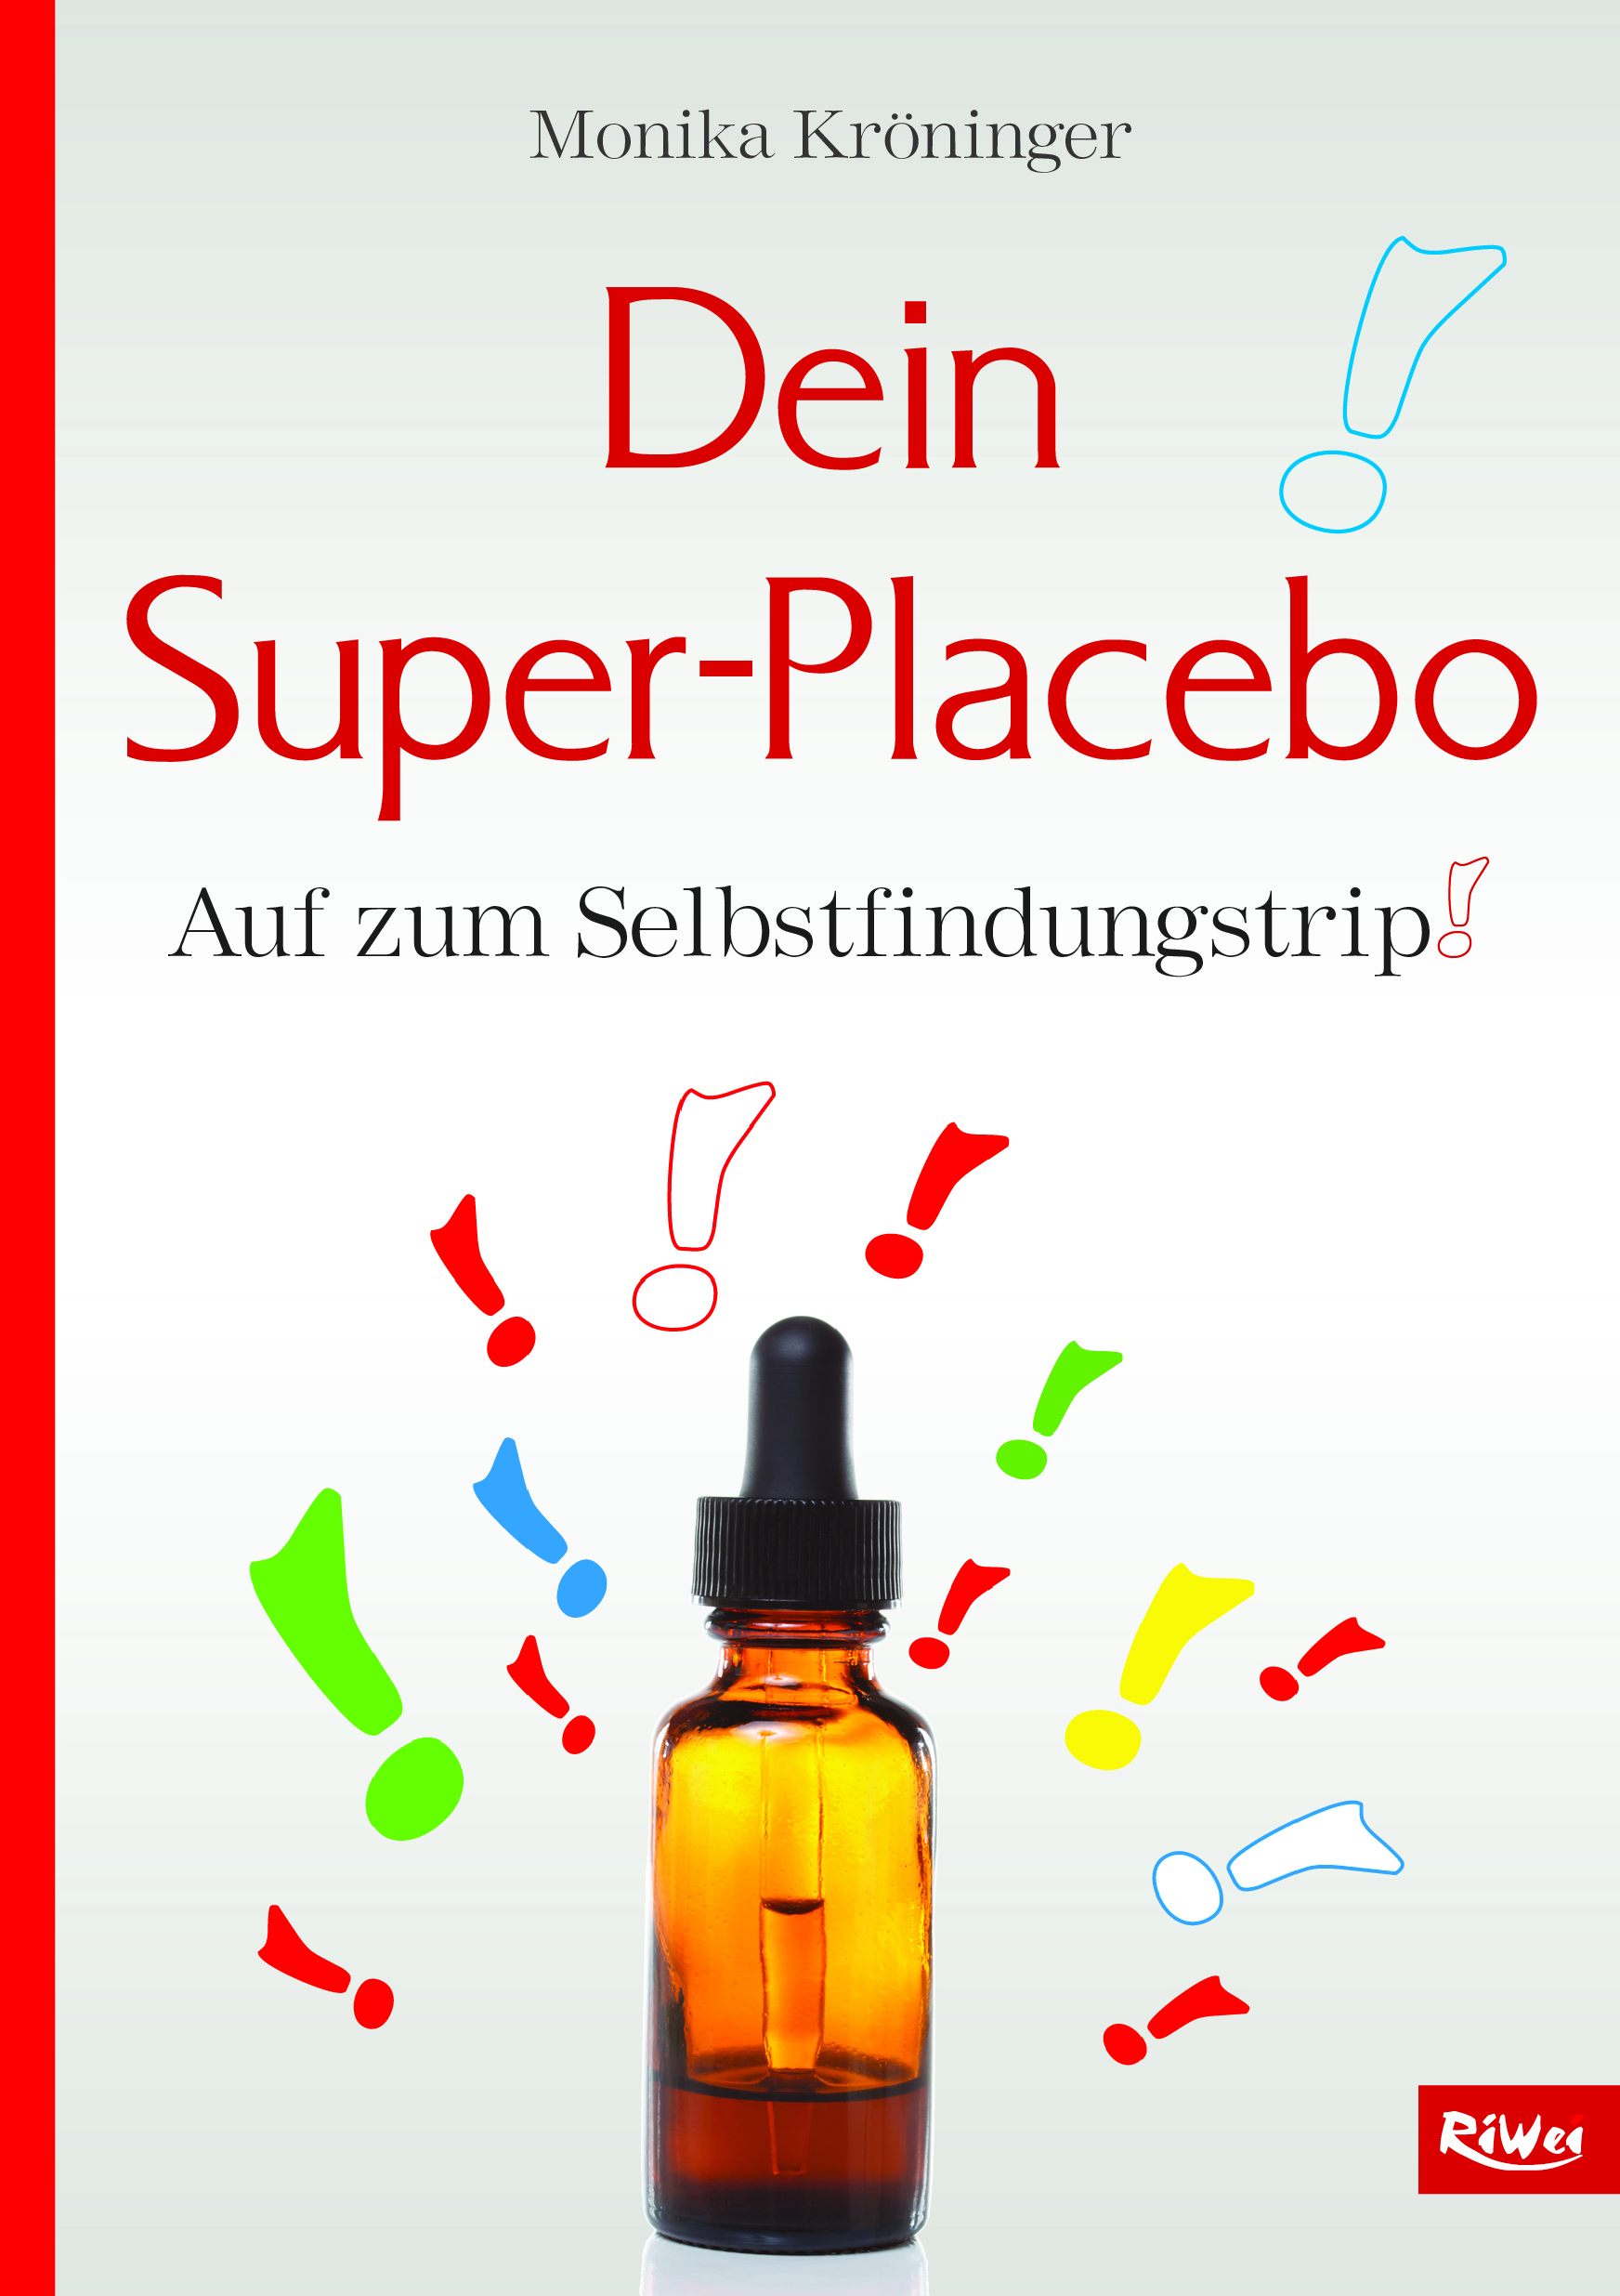 Monika Kröninger- Dein Super-Placebo